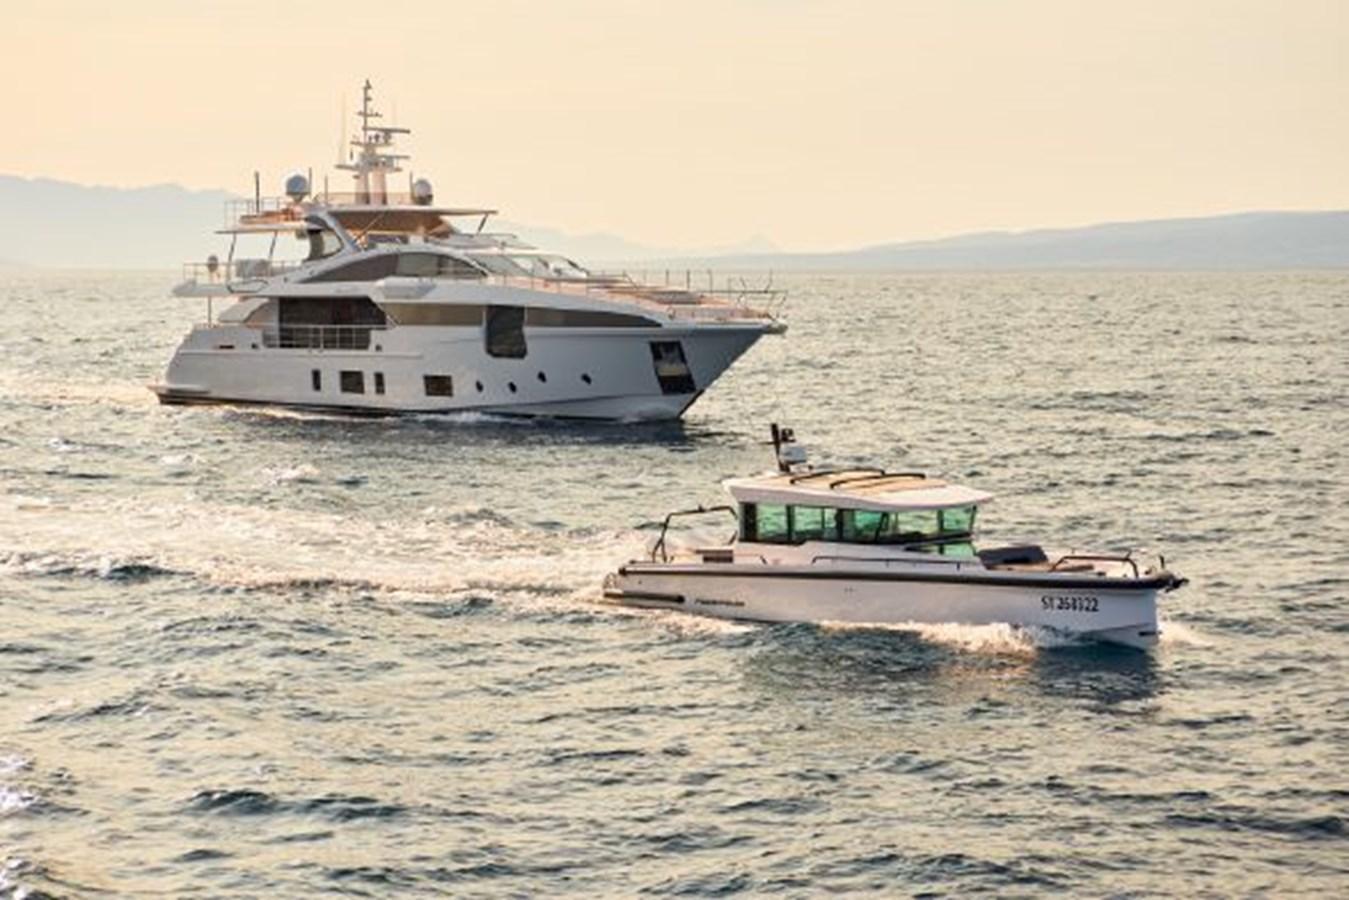 2019 Azimut Grande 35 Metri yacht for sale